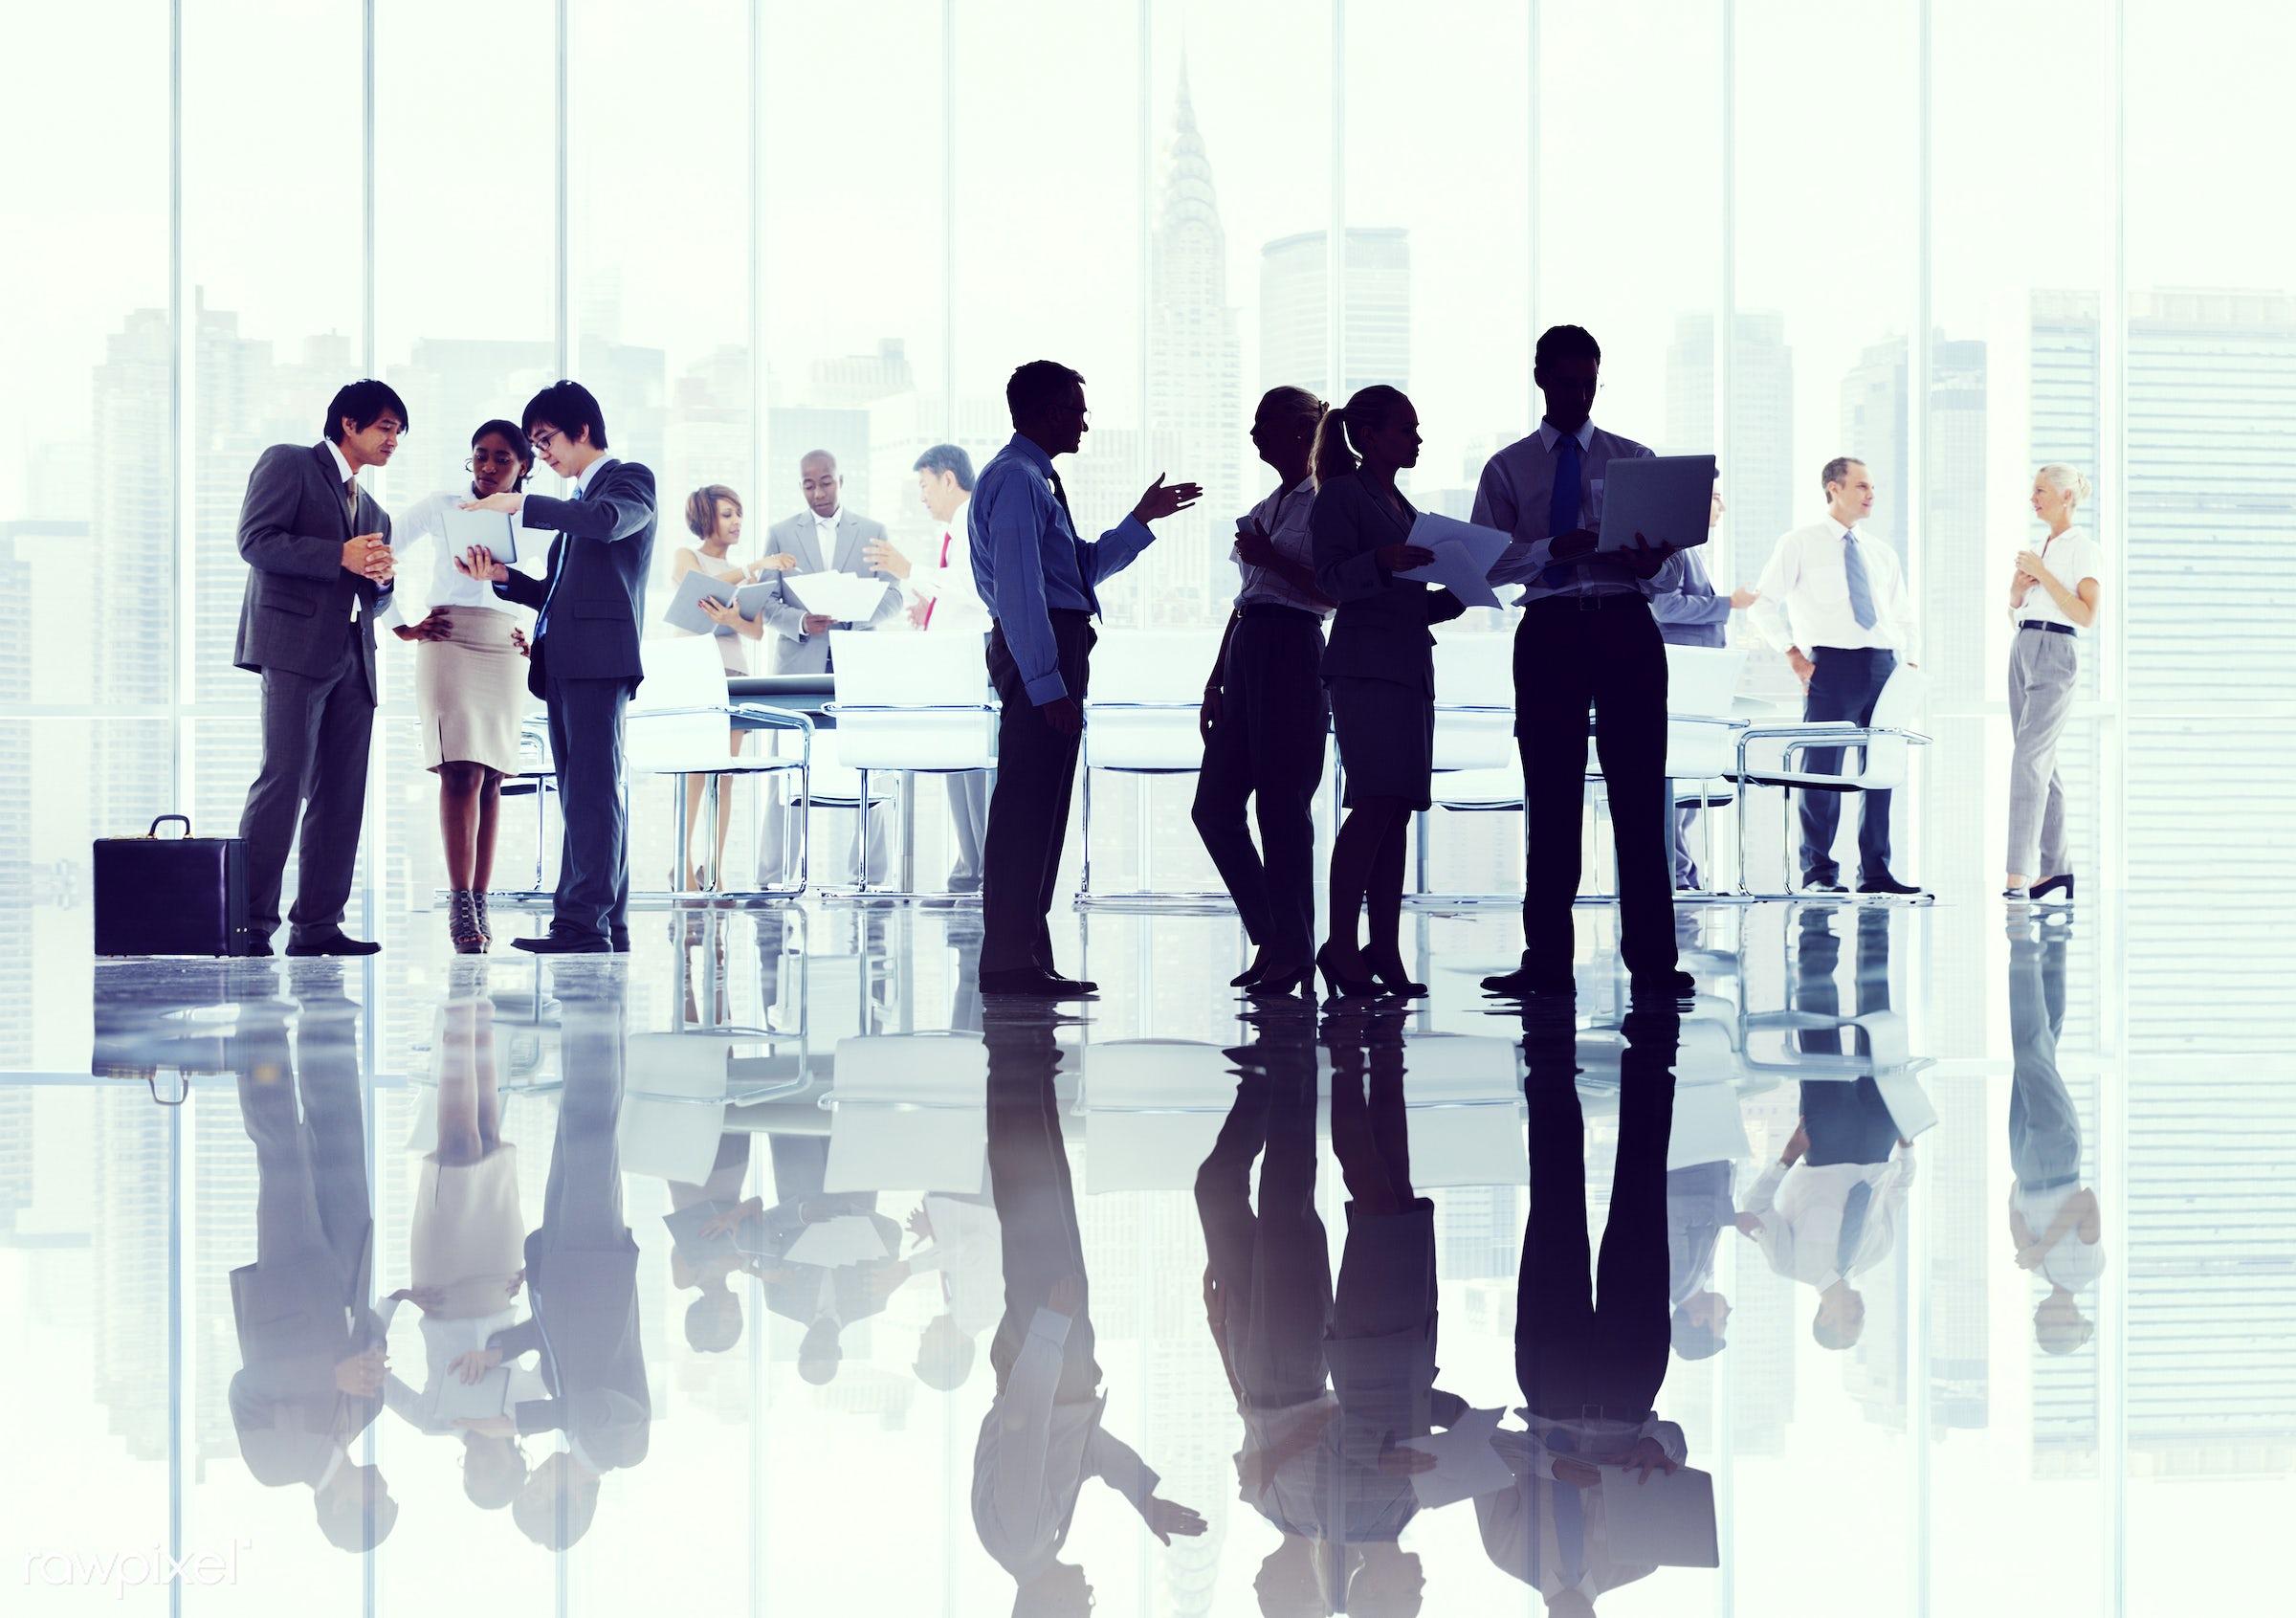 brainstorming, building, business, business people, businessmen, businesswomen, cityscape, colleagues, communication,...